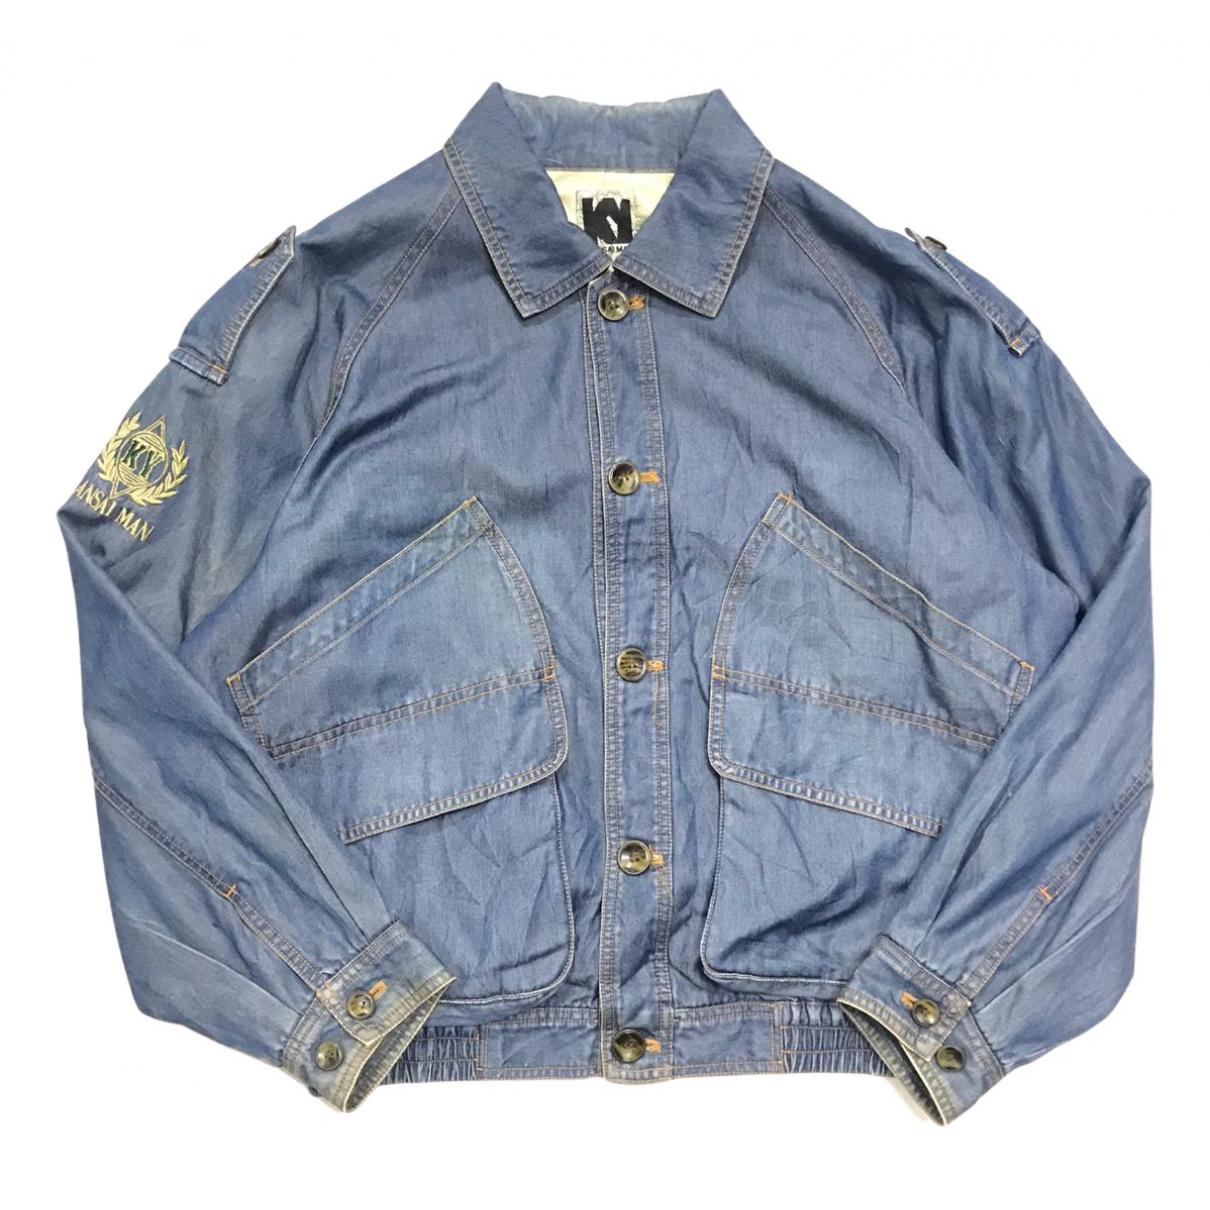 Kansai Yamamoto - Vestes.Blousons   pour homme en denim - bleu